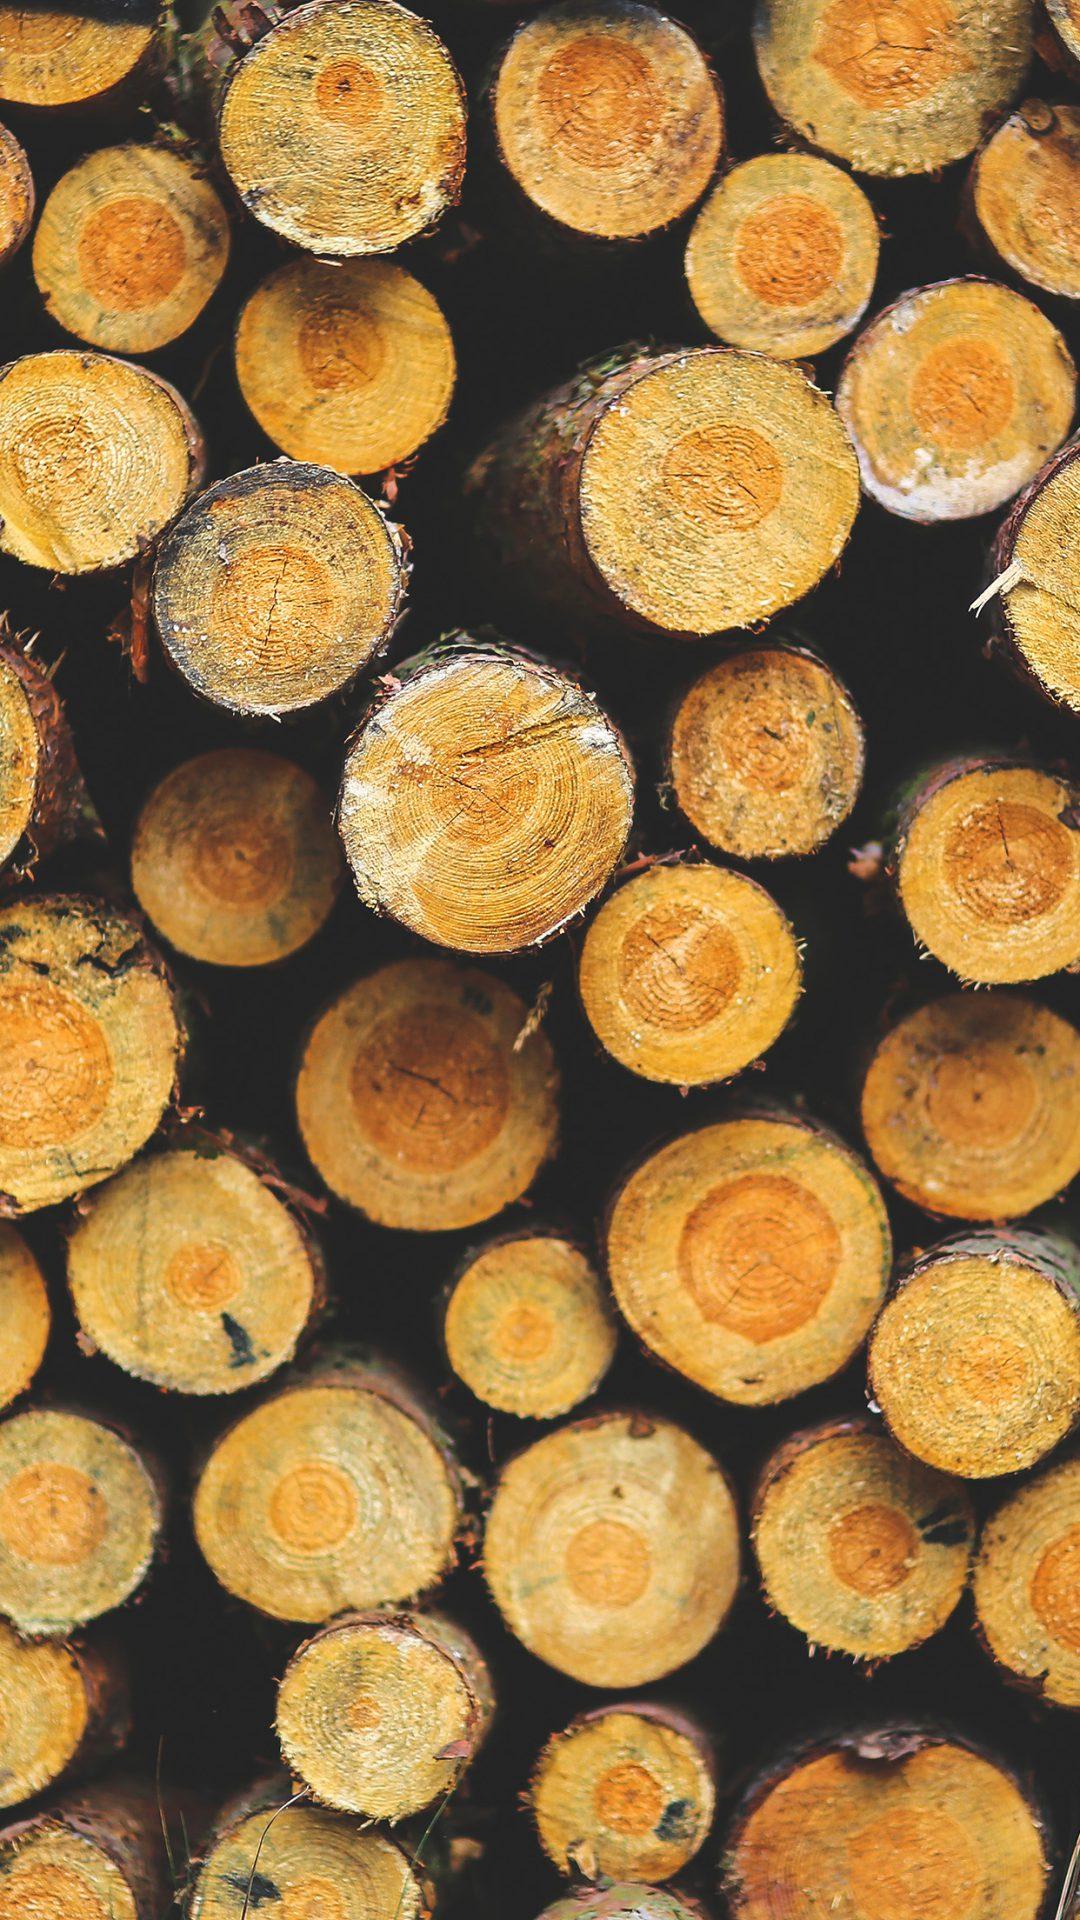 Wood Circle Piles Nature Pattern